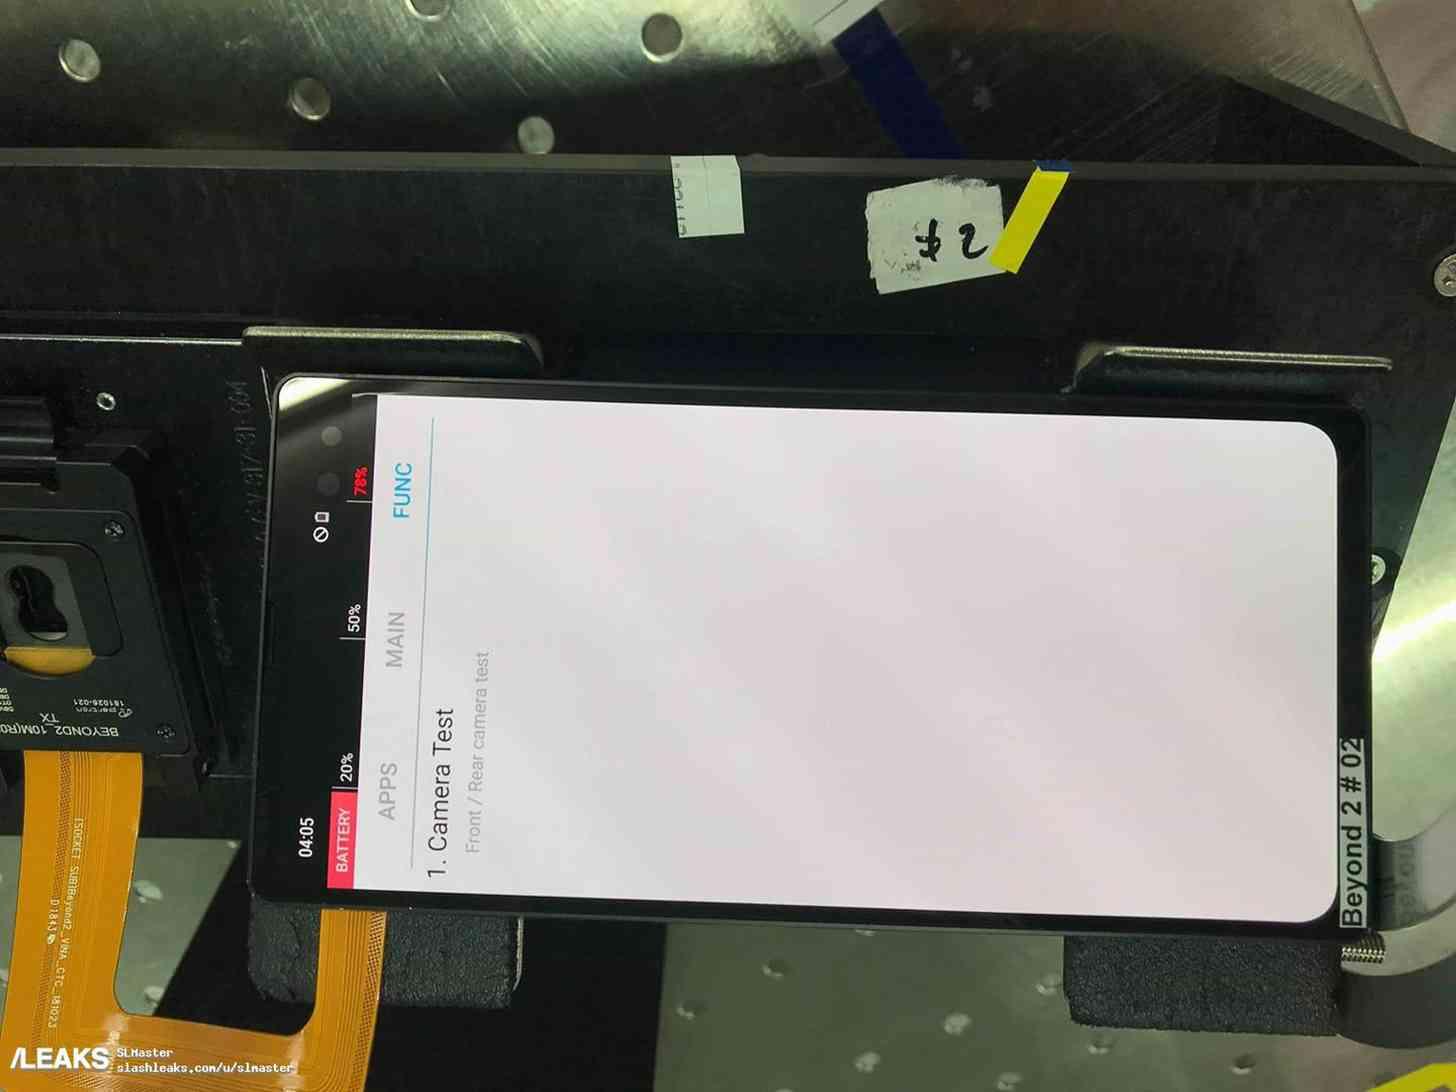 Samsung Galaxy S10+ prototype photo leak